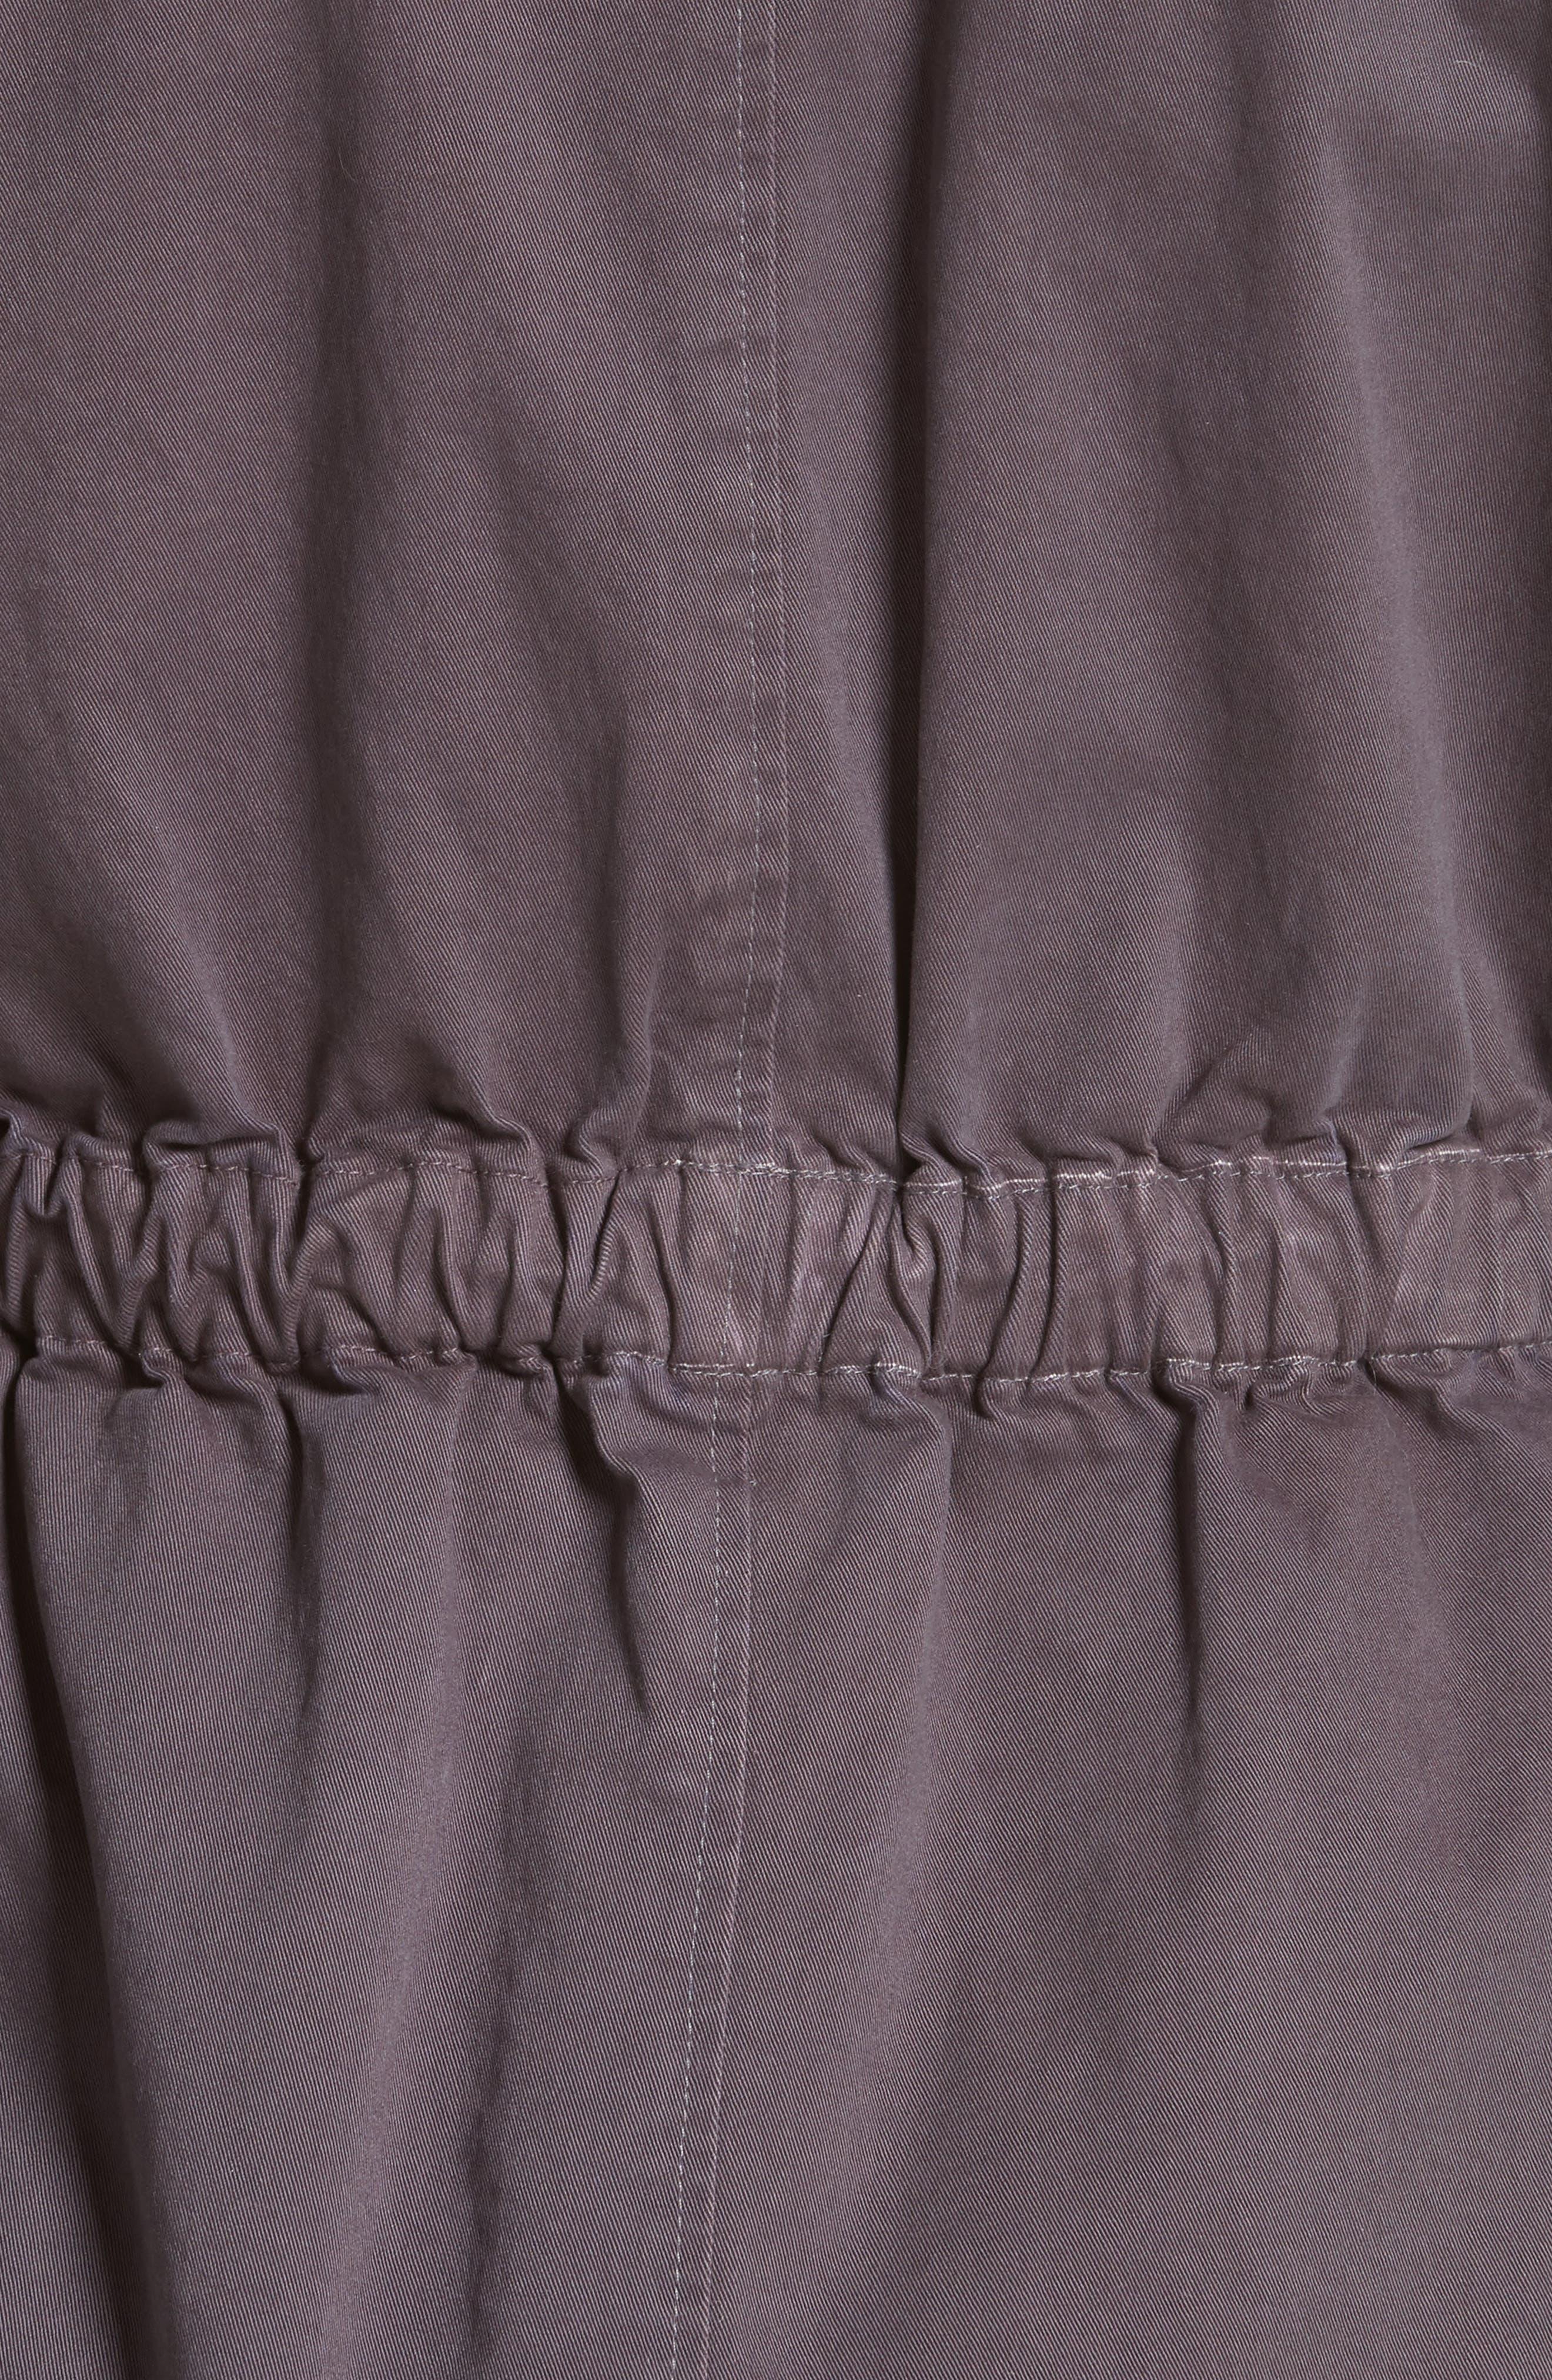 Twill Utility Jacket,                             Alternate thumbnail 5, color,                             Shadow